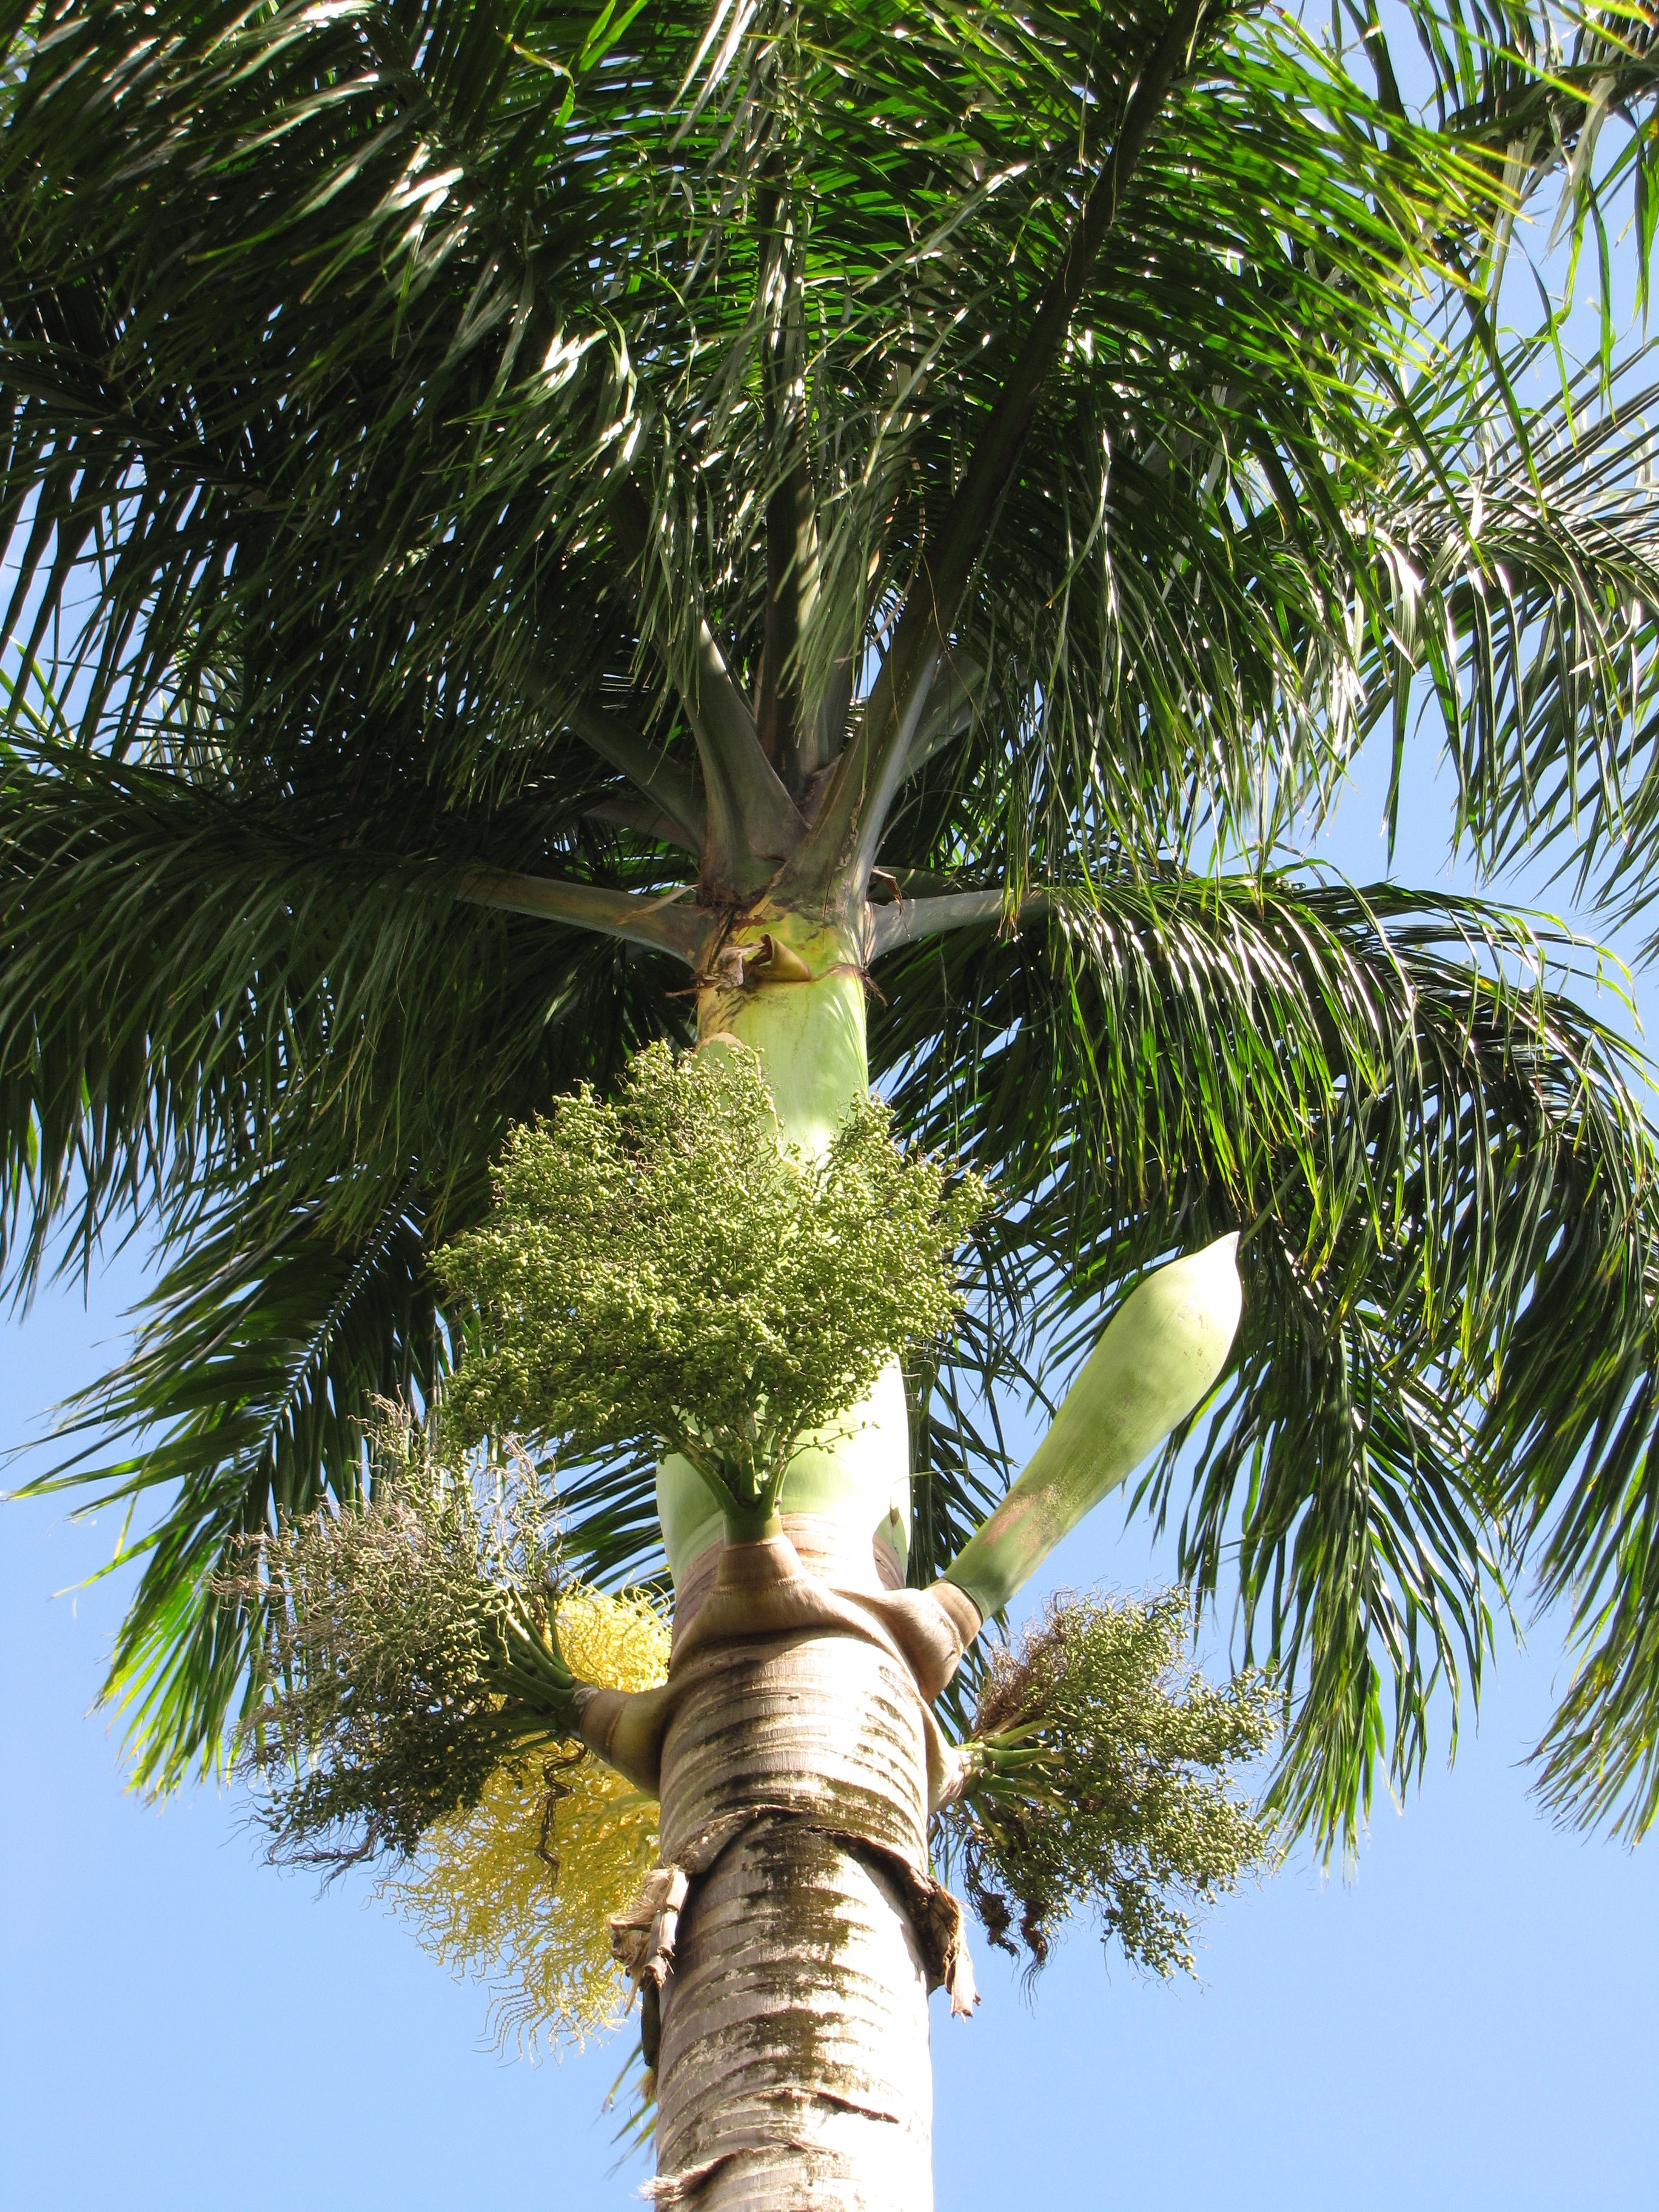 royal palm trees pinterest growing tree tree. Black Bedroom Furniture Sets. Home Design Ideas